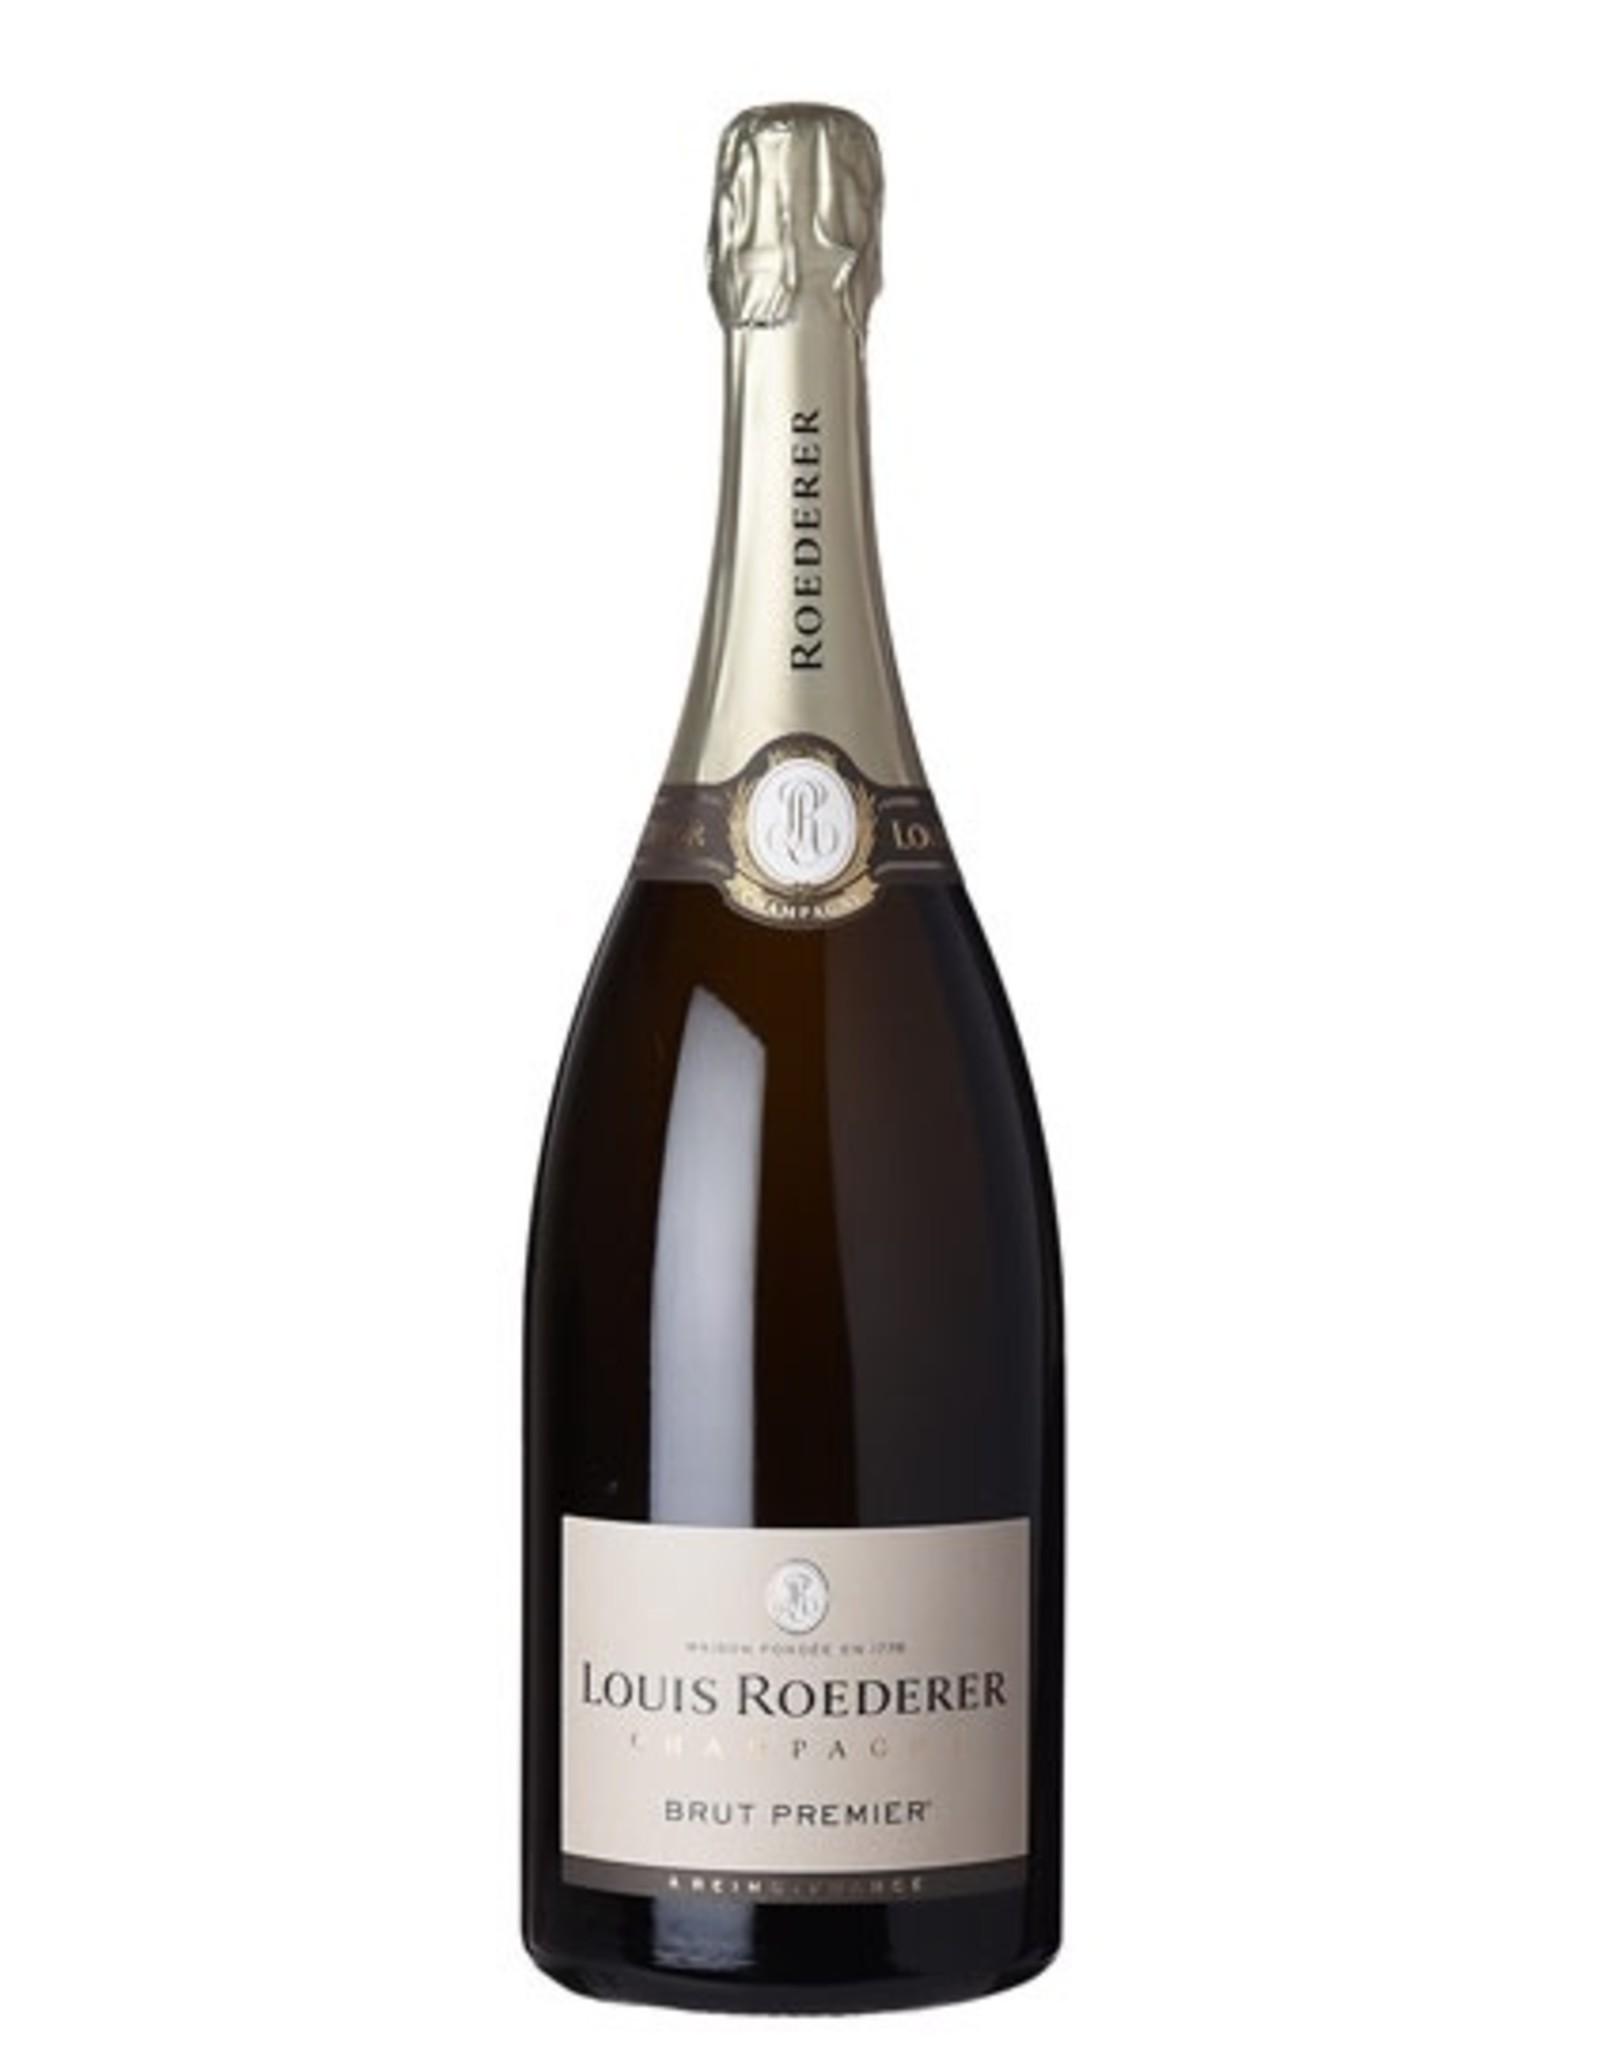 Sparkling Wine NV, 1.5l Louis Roederer Brut Premier, Champagne, Reims, Champagne, France, 12% Alc, CT89